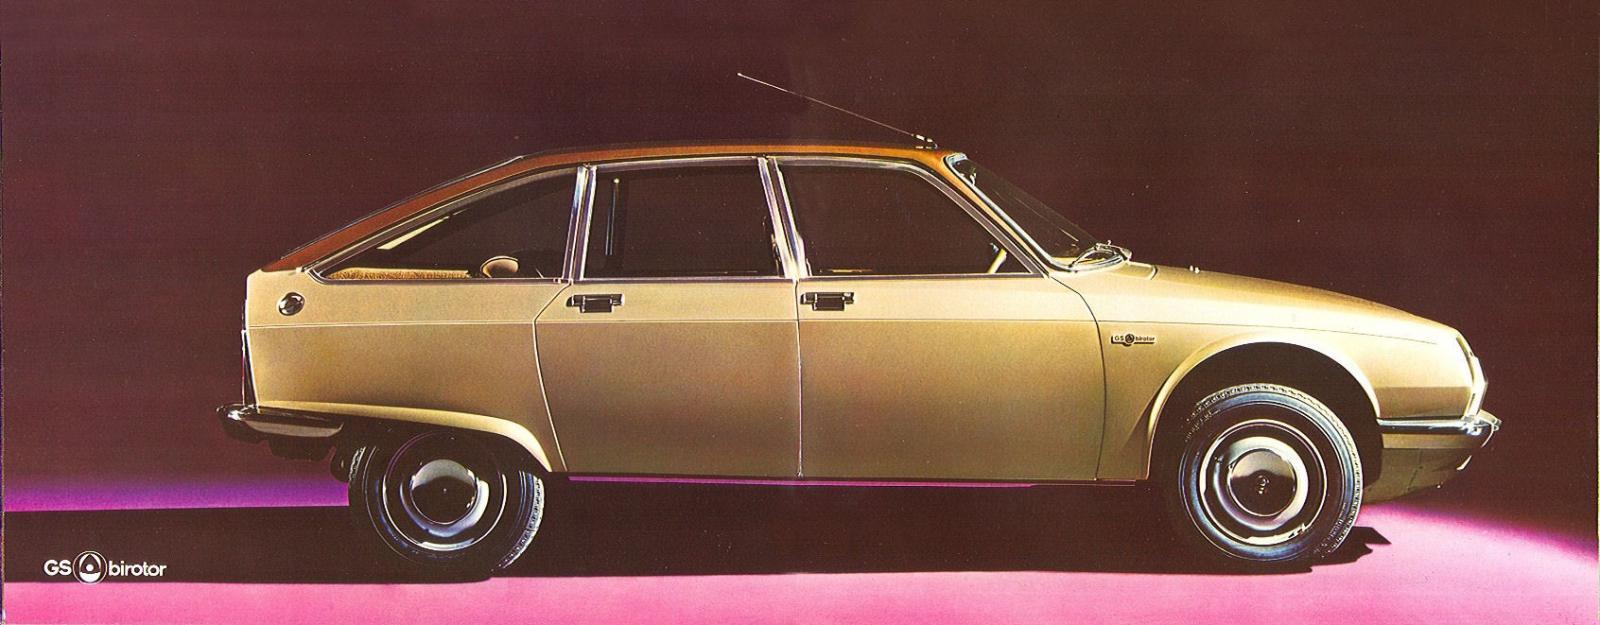 GS Birotor 1973 profil